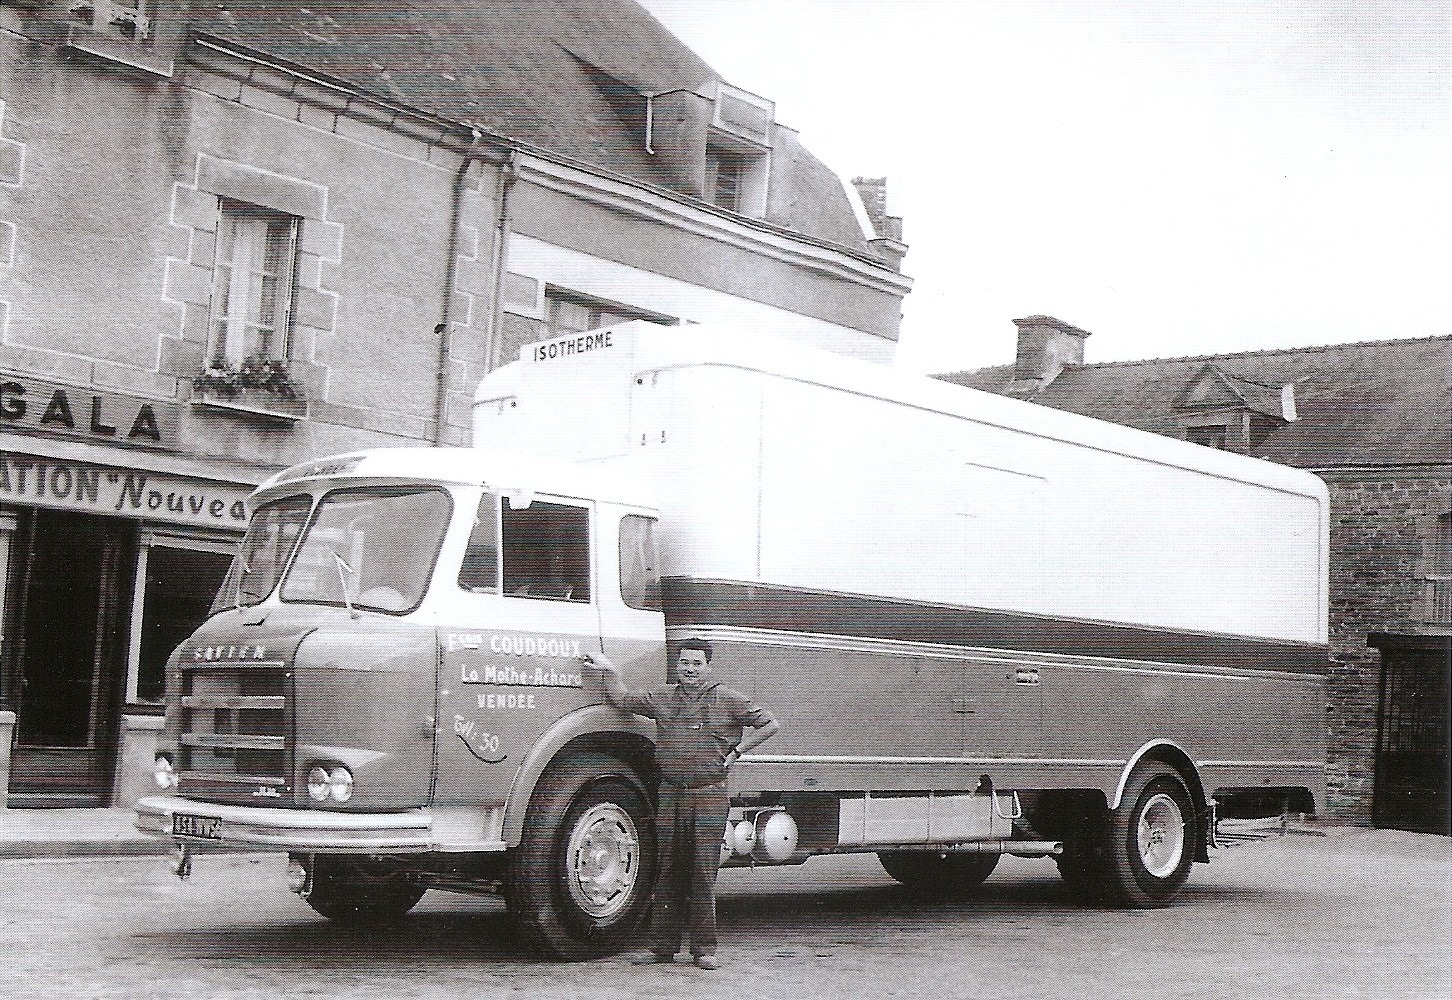 Claude-Breteaud-photo-archive-3